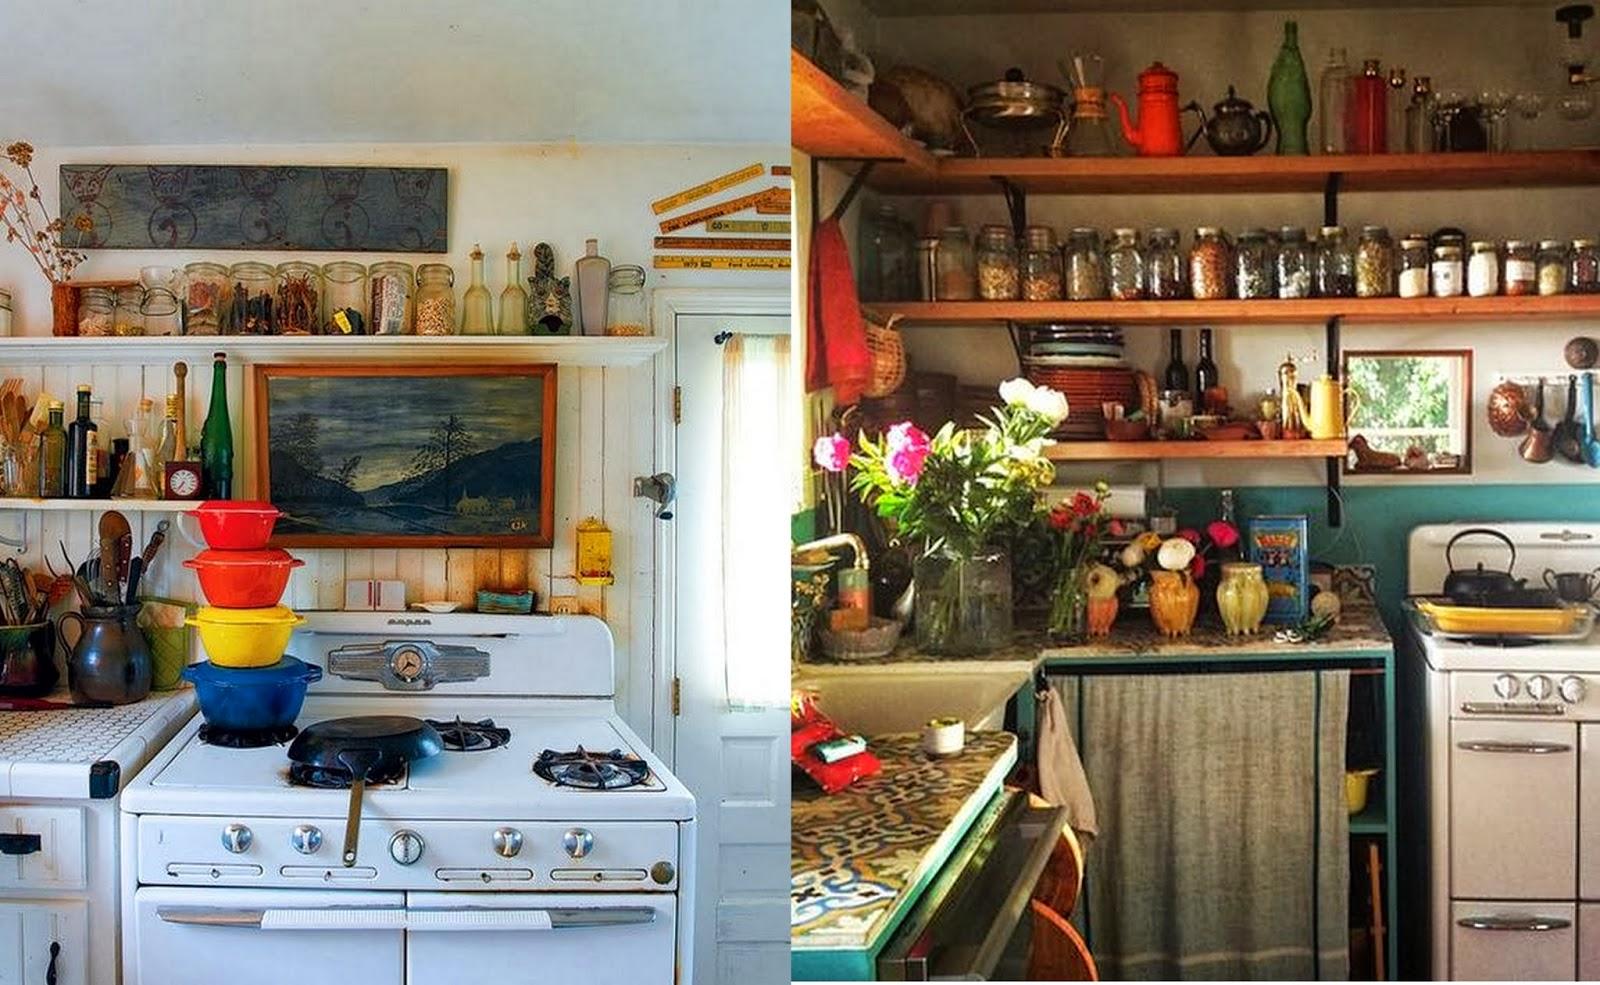 Cheap Kitchen Sinks Tall Bin Gypsy Yaya: Open Shelvin' In The & Other Rental ...